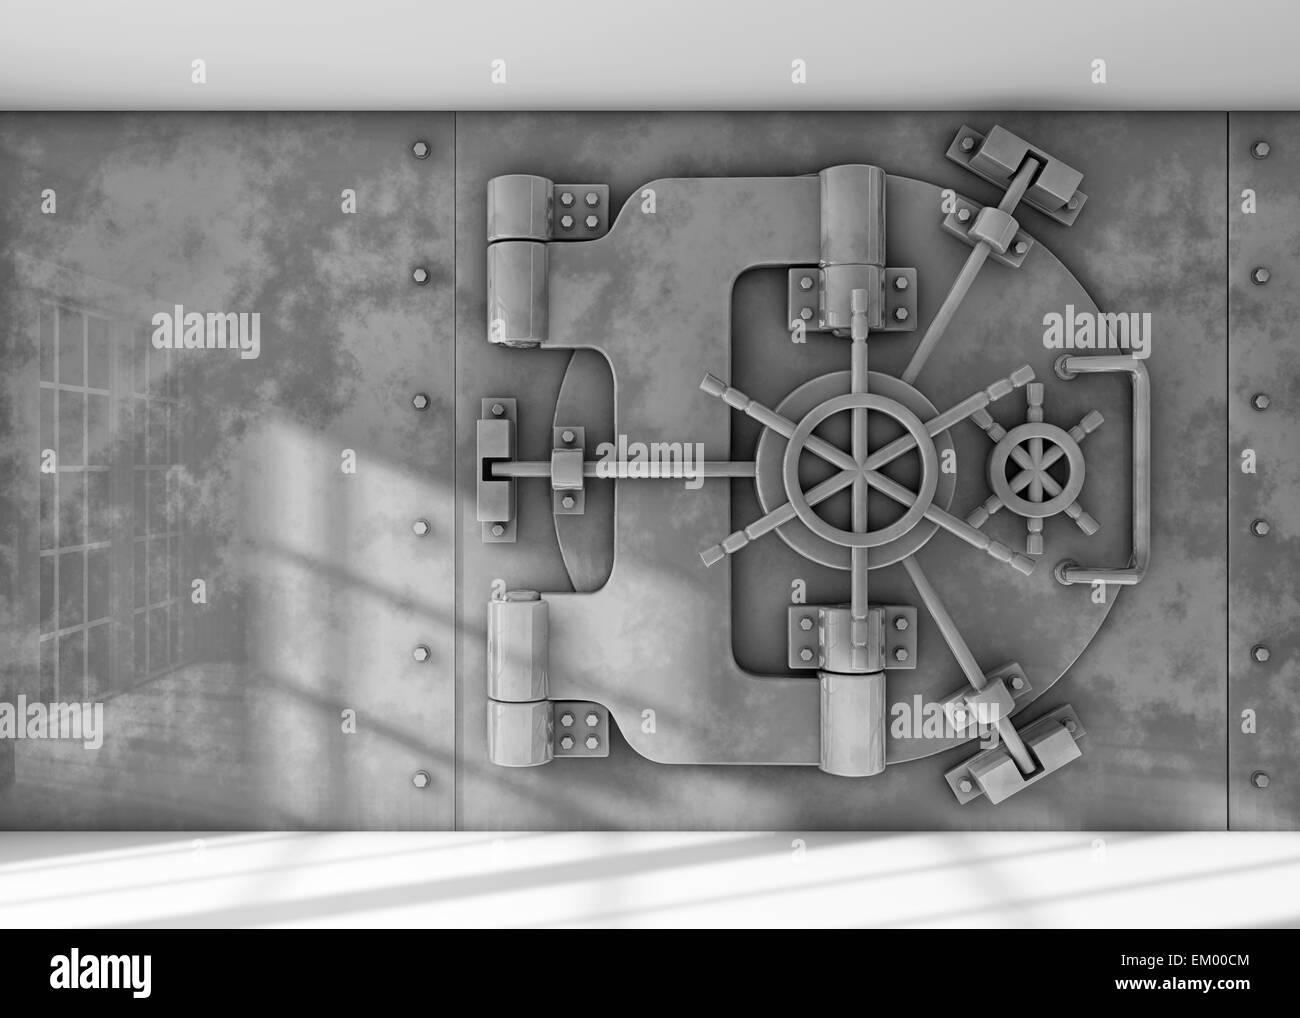 Vault background - Stock Image